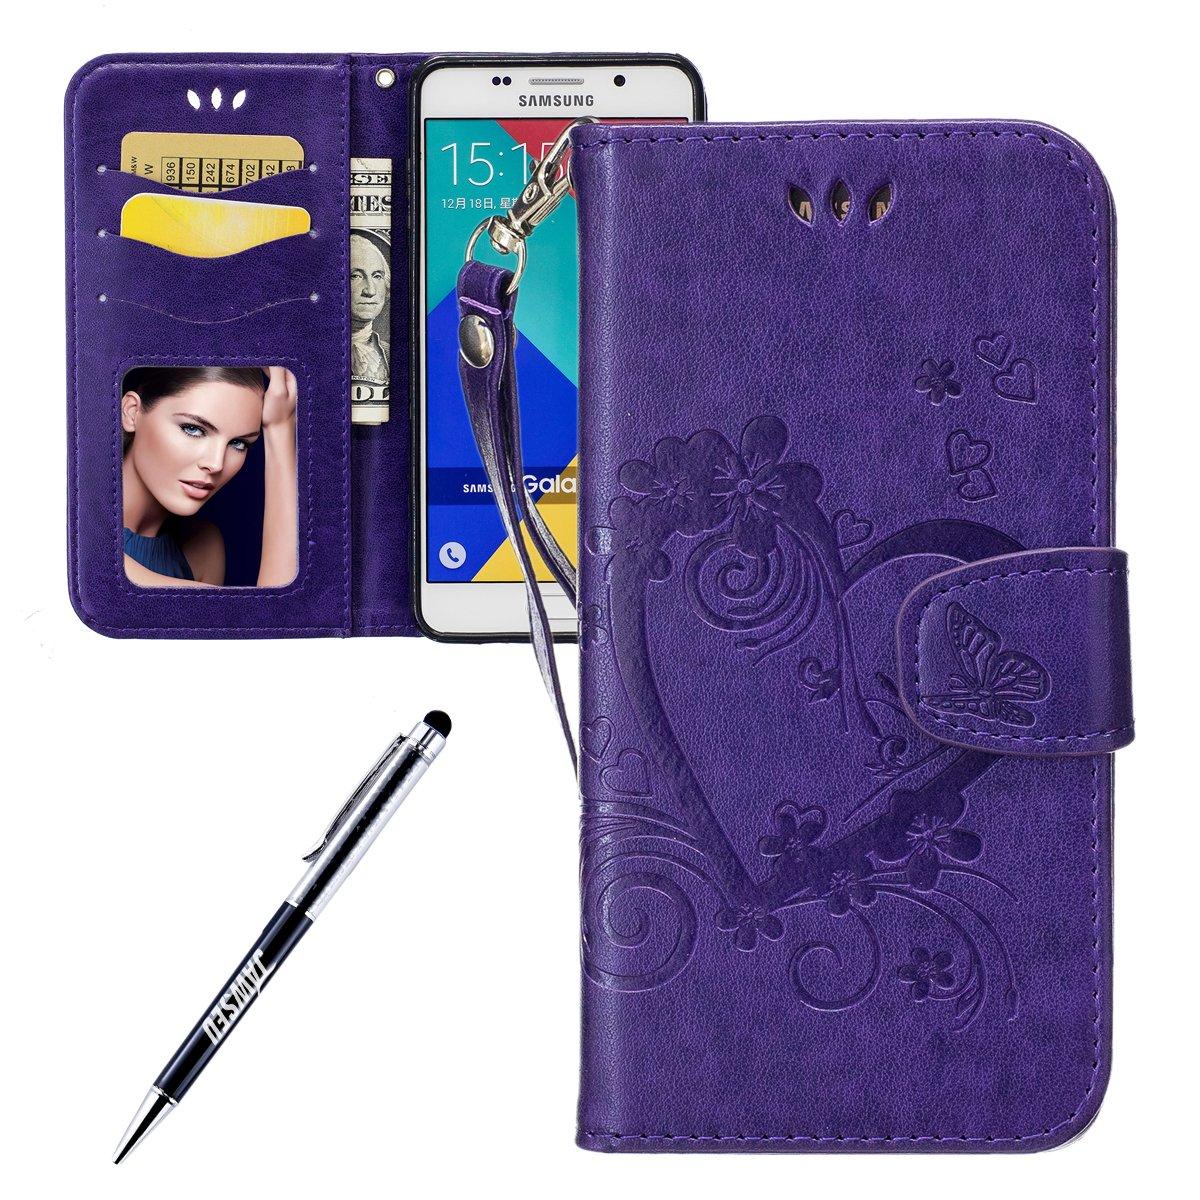 JAWSEU Coque Etui Samsung Galaxy A5 2016 Portefeuille PU Étui Folio en Cuir à Rabat Magnétique Luxe Retro Coeur d'amour Ultra Mince Stand Leather PU Case Flip Wallet Case JAWSEU0041016